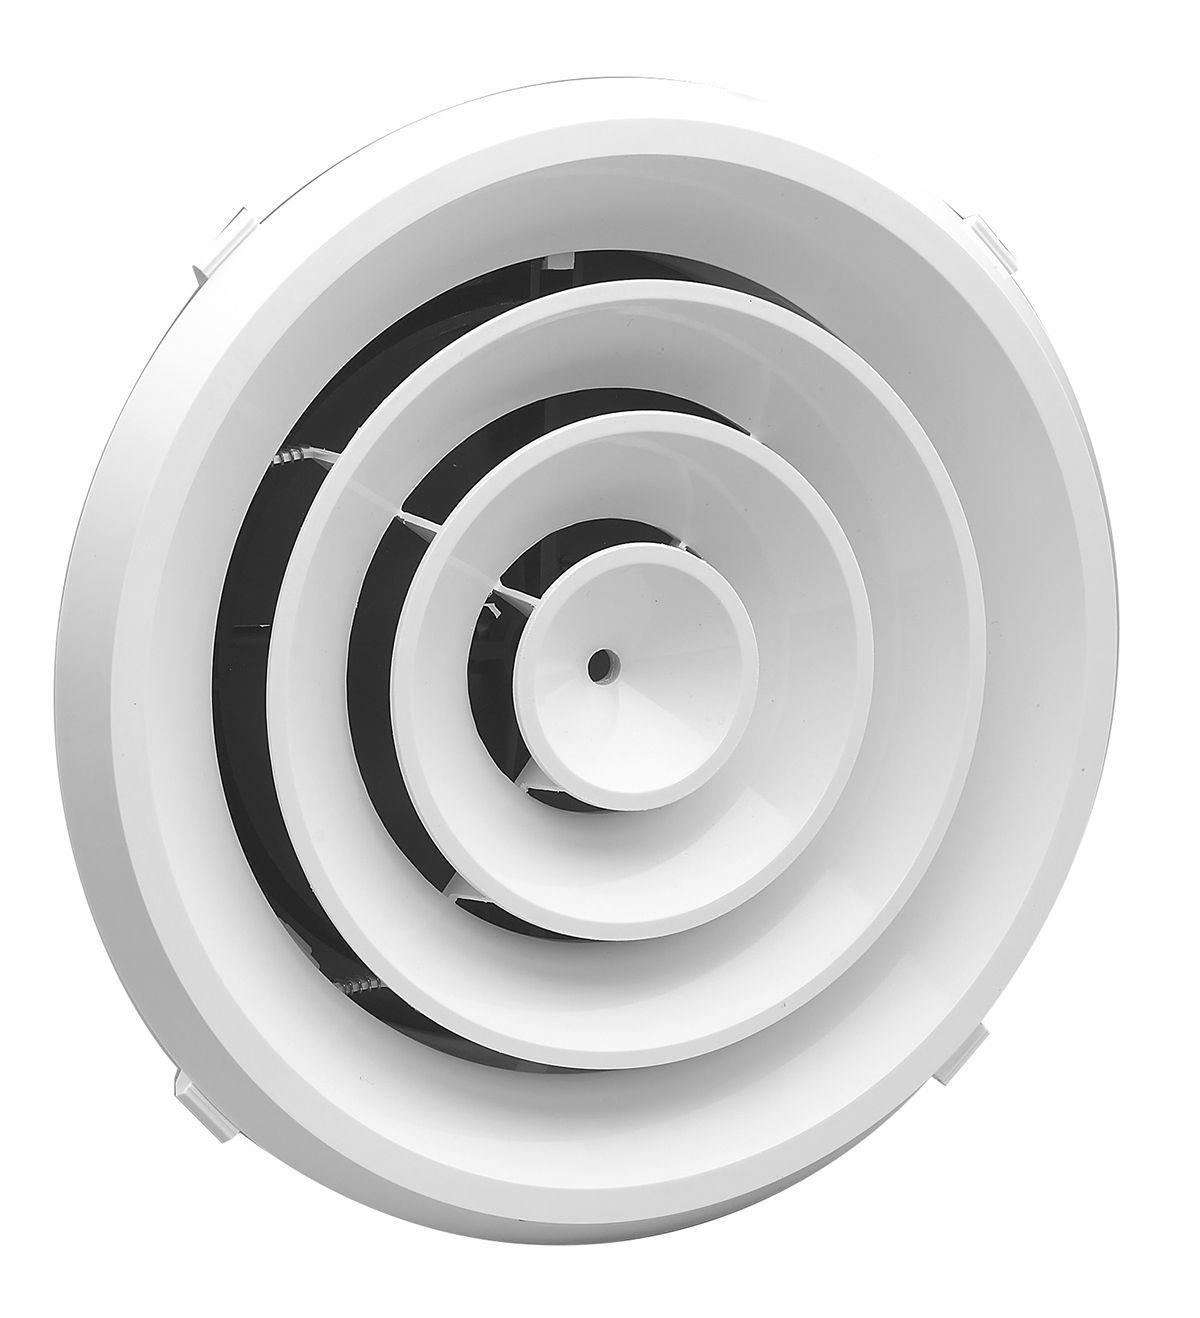 Hart Amp Cooley Rezzin Rz Round Ceiling Diffuser